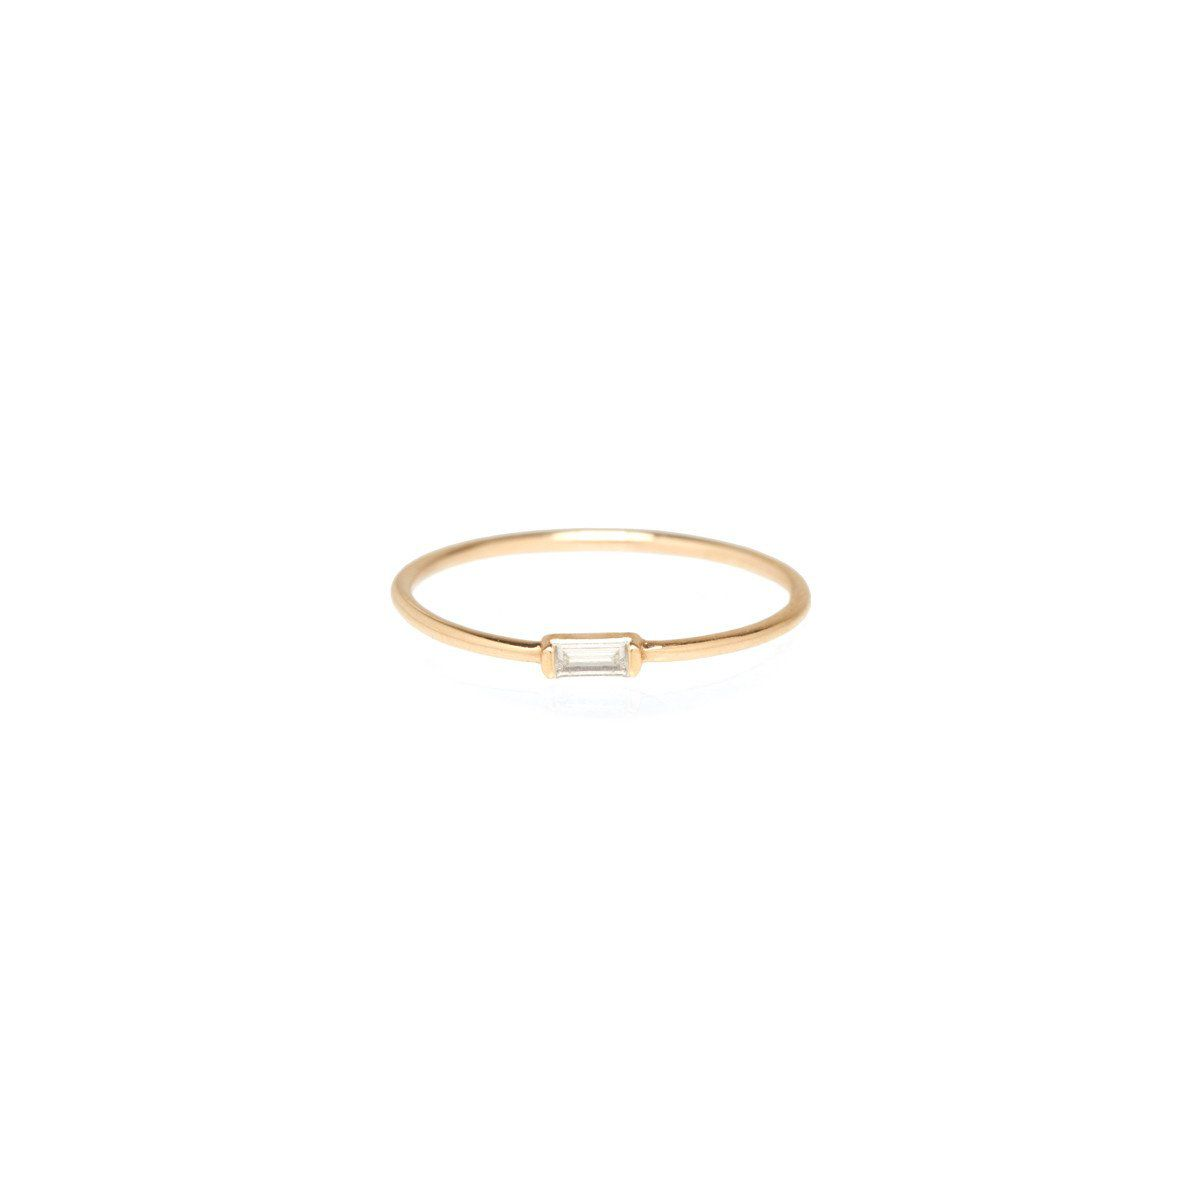 Zoë Chicco Horizontal Baguette Ring